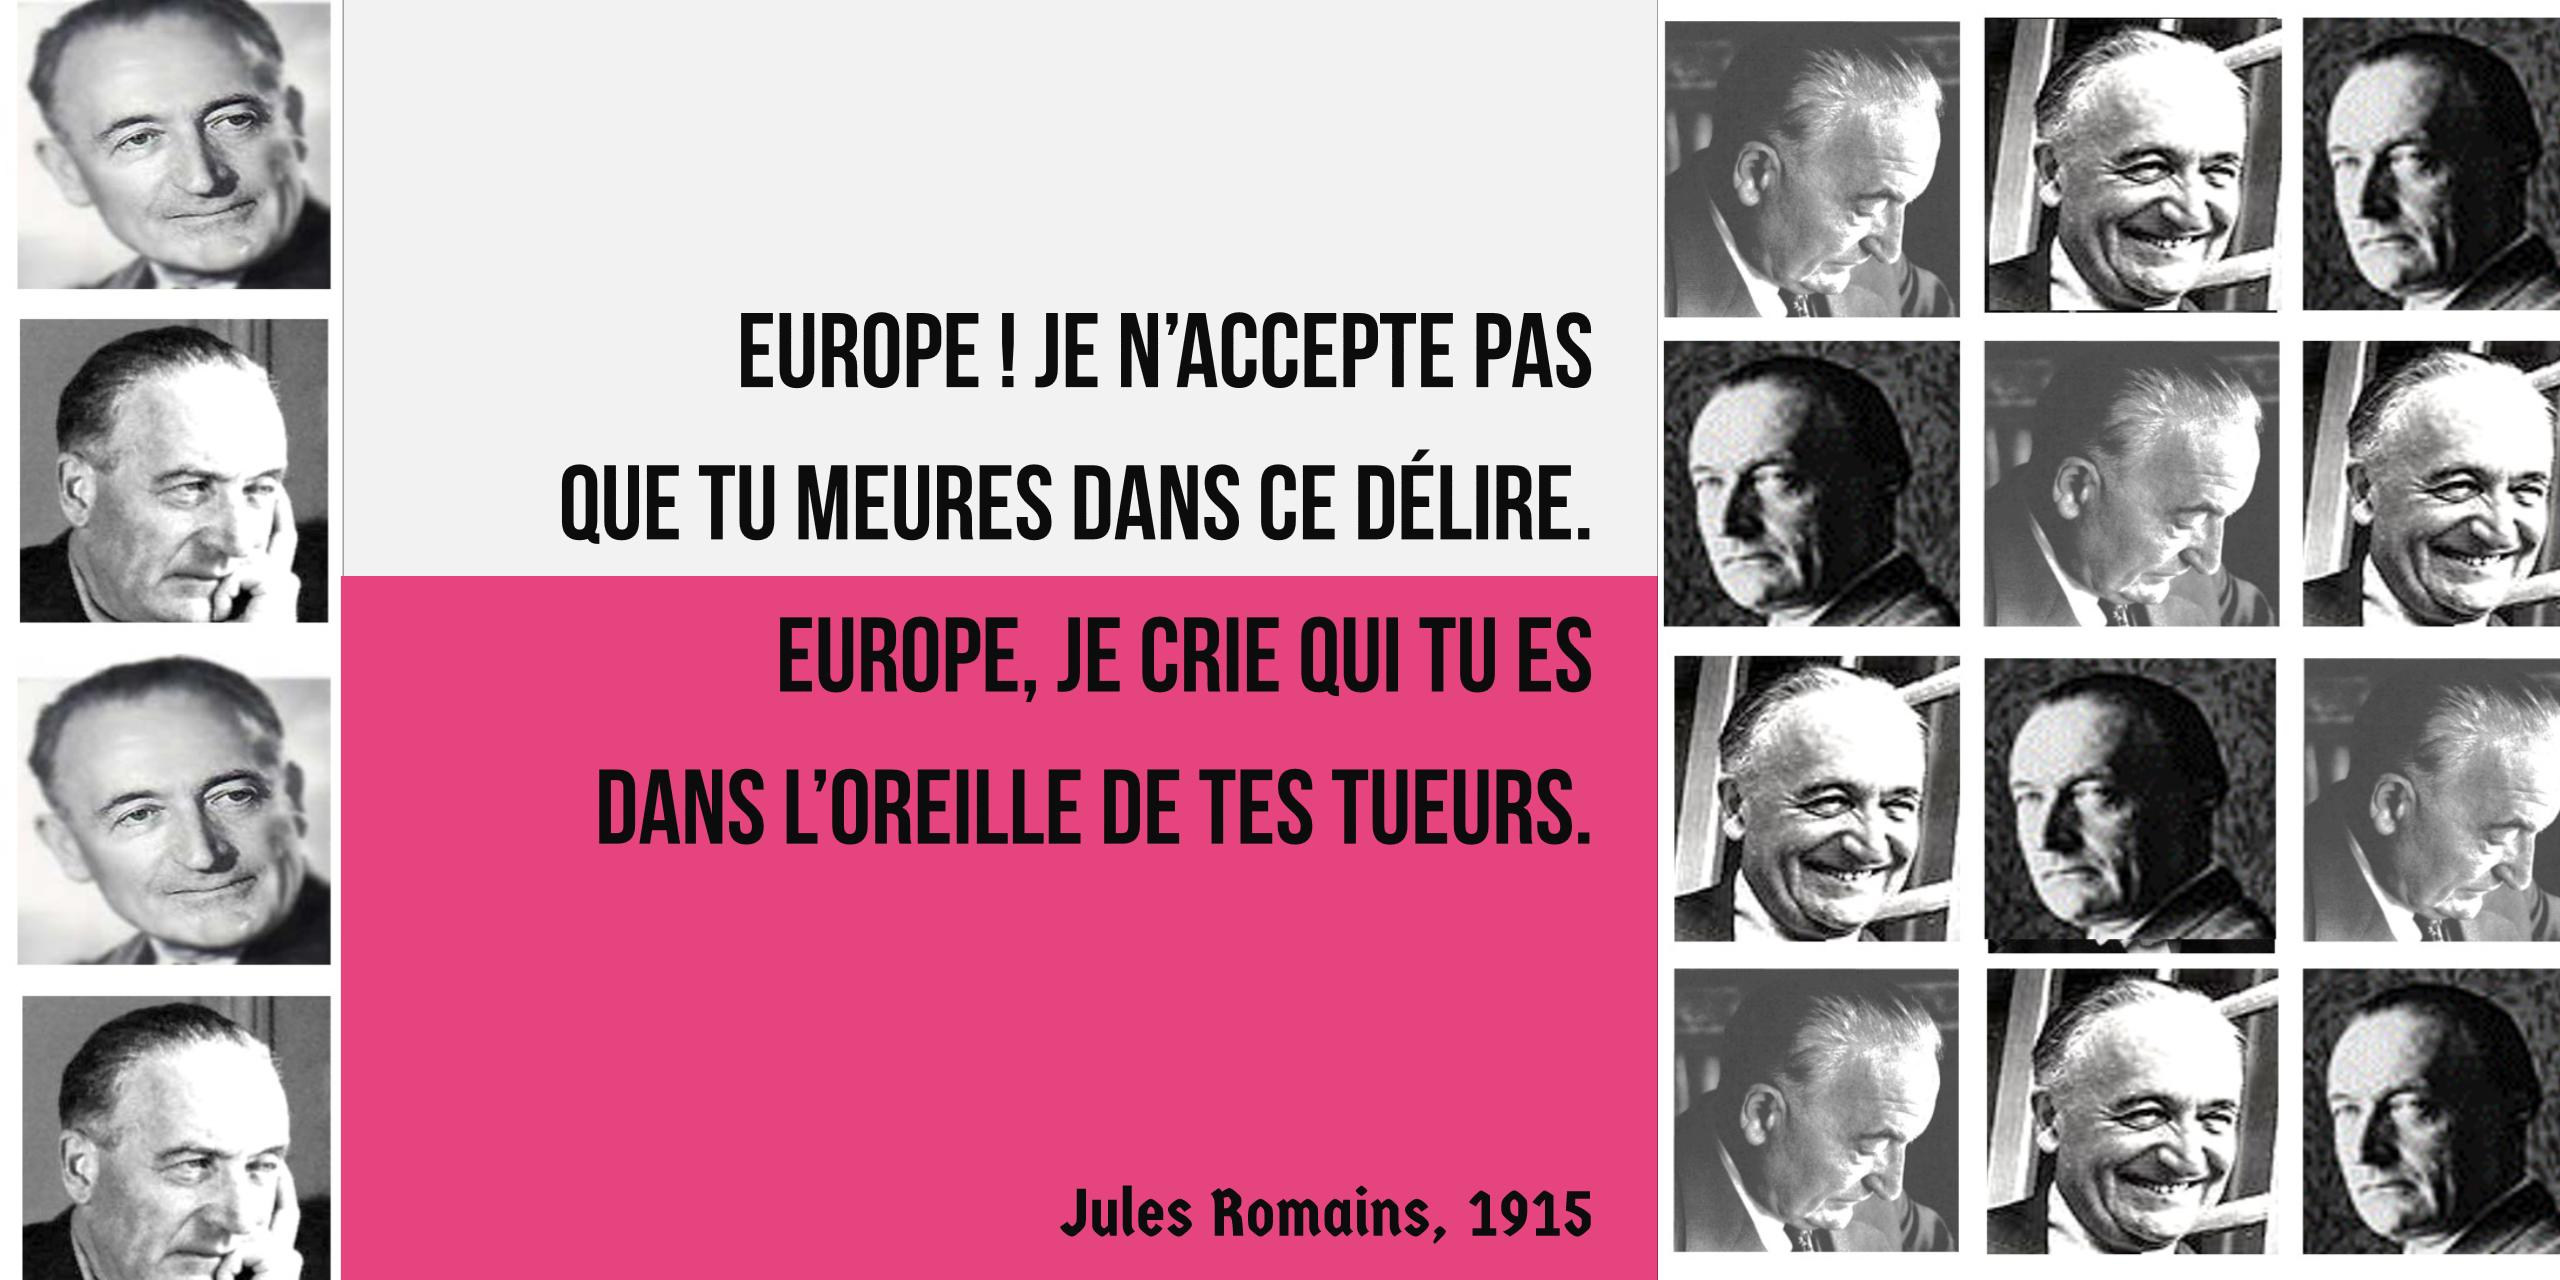 Jules Romains